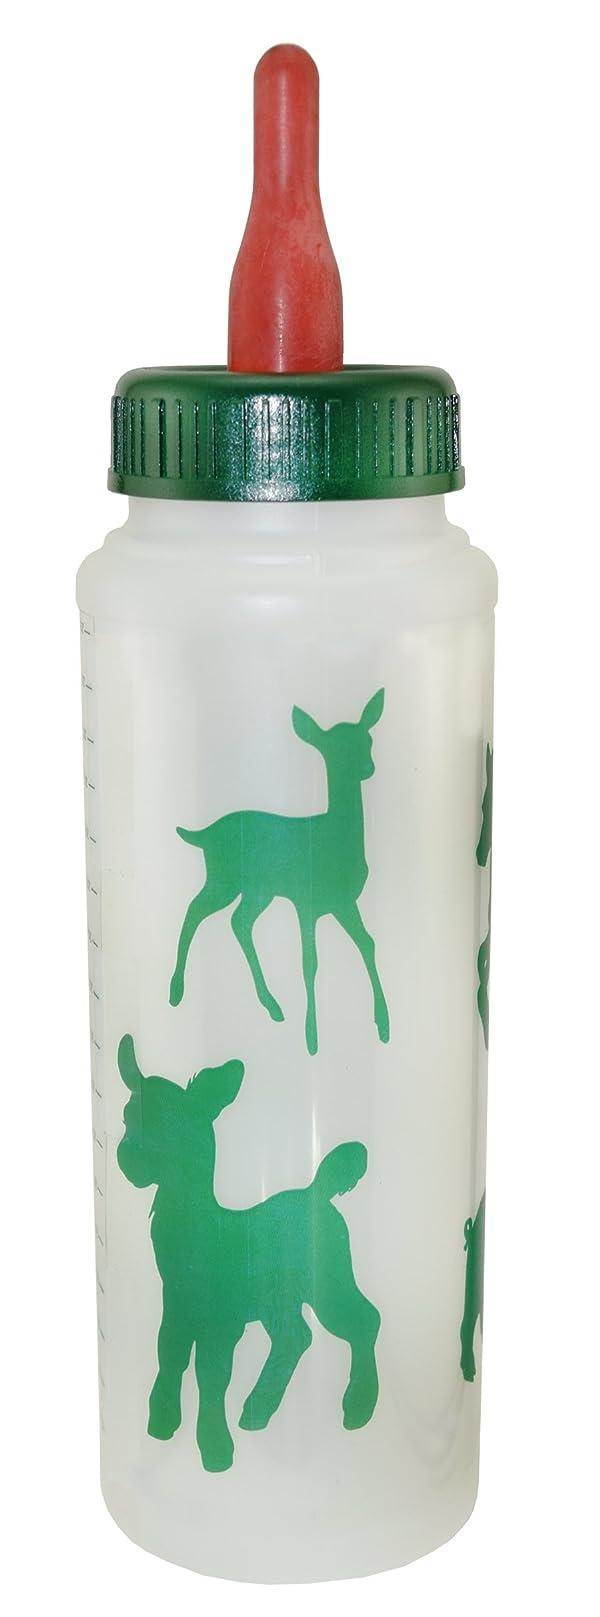 Lixit Animal Care Lixit Farm Baby Bottle, 1 Quart (Tamaño: 1 Quart)